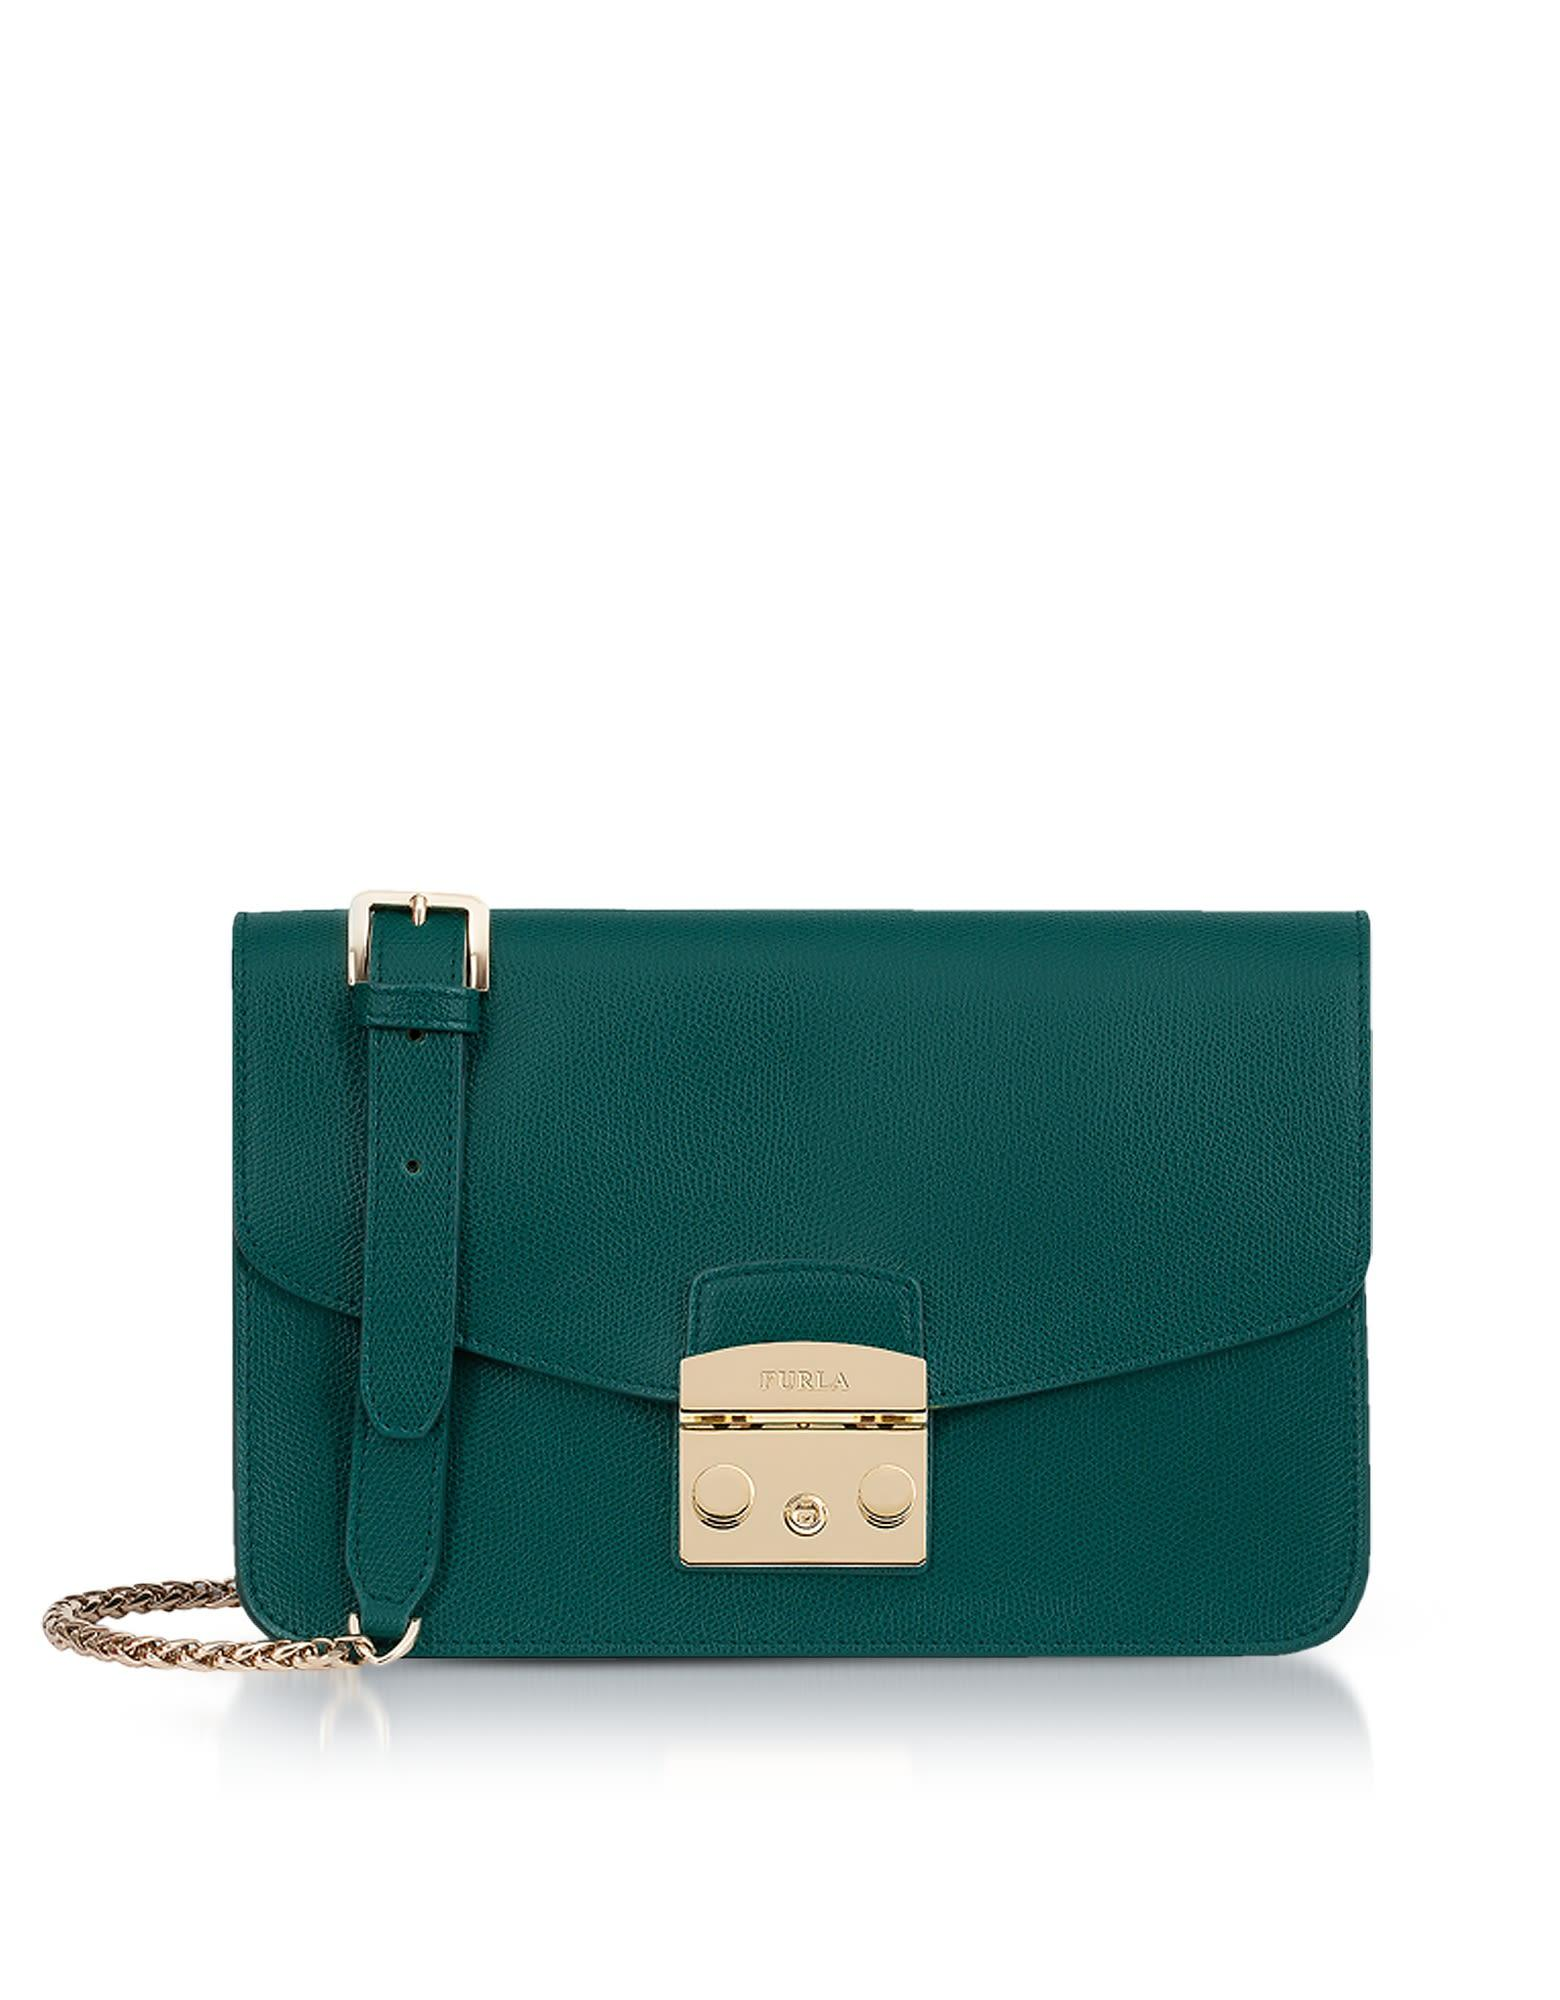 0dd7028e5208 Furla Genuine Leather Metropolis Small Shoulder Bag In Forest Green ...